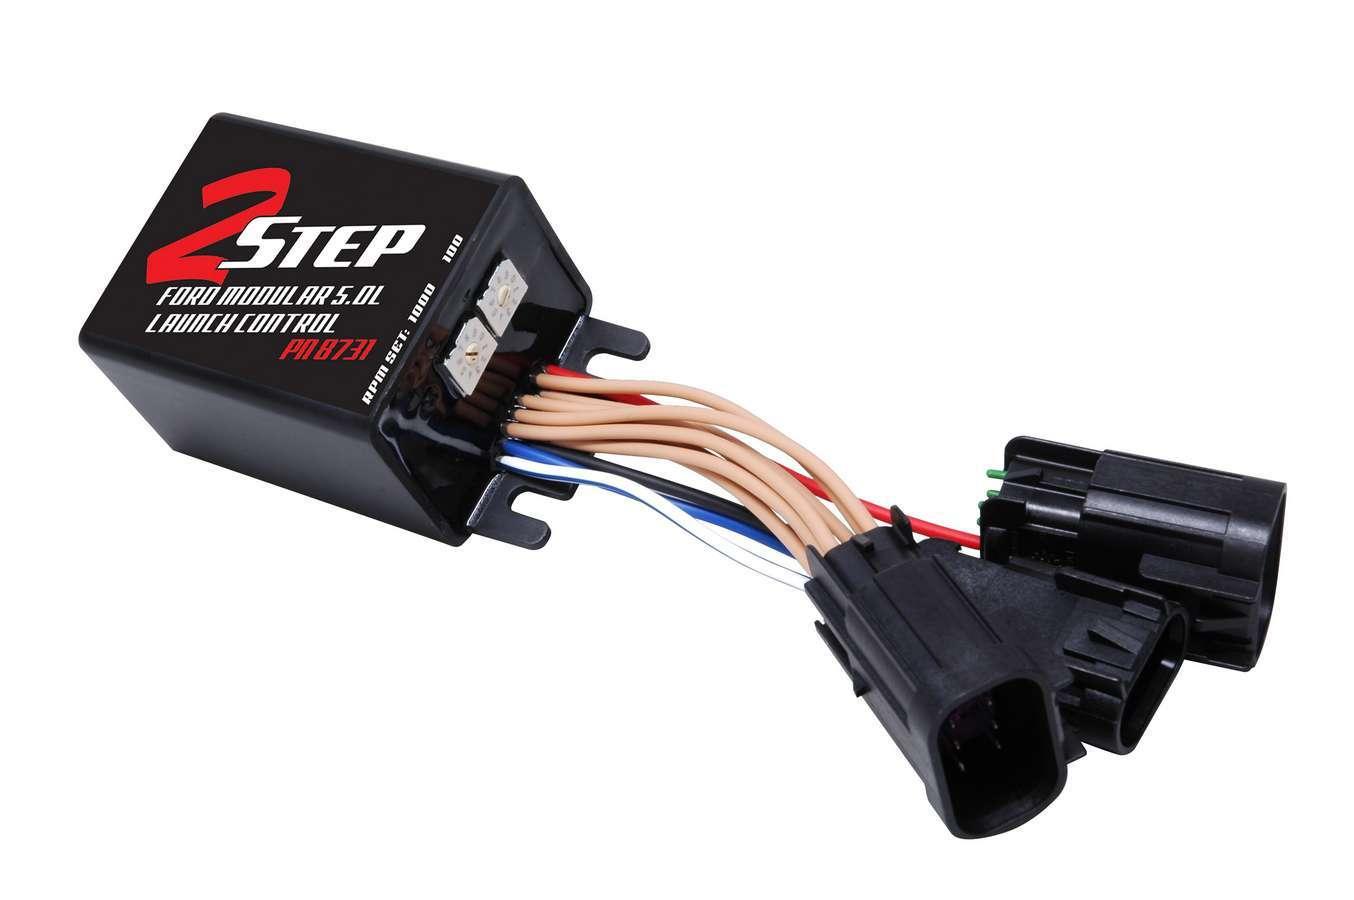 Msd Ignition Digital 2-Step Rev Control - 2011 Ford 5.0L